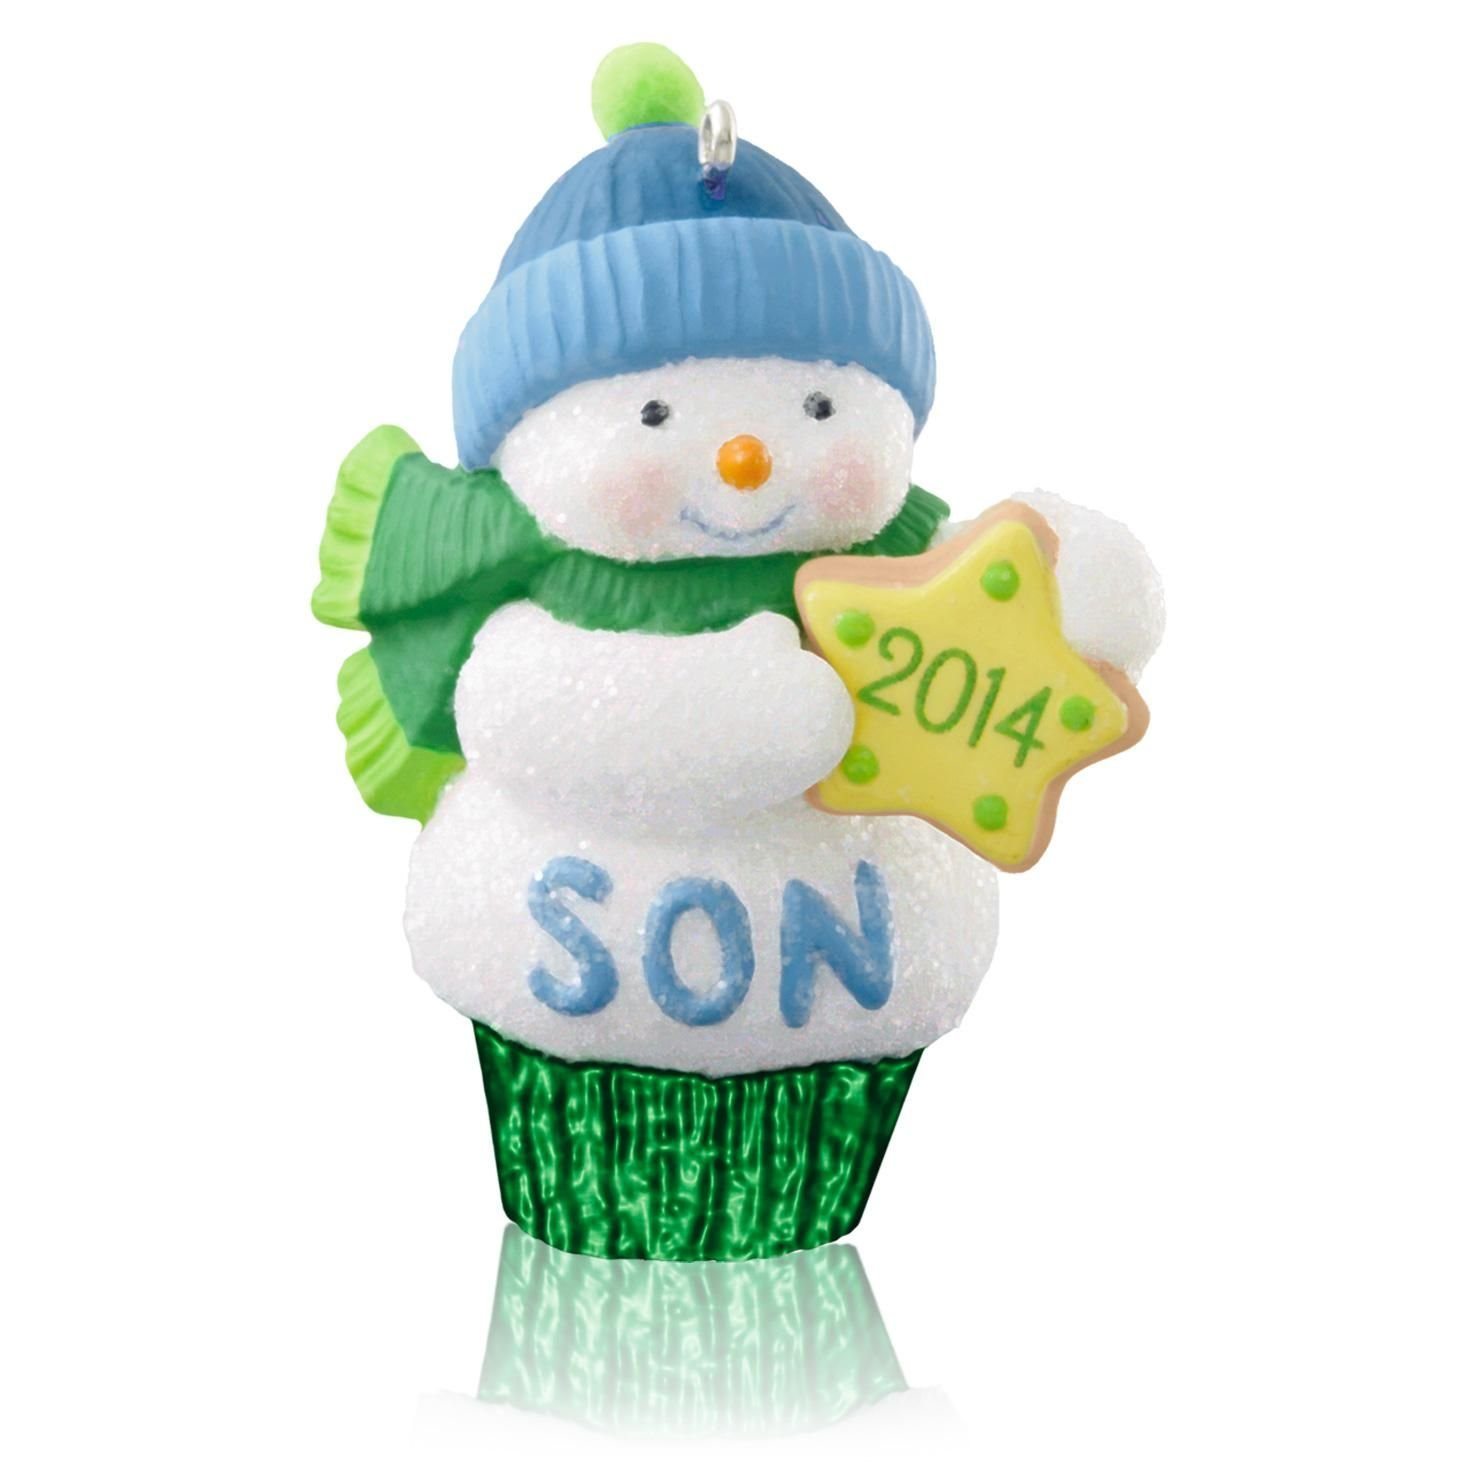 Amazon.com: 1 X Son - 2014 Hallmark Keepsake Ornament: Home & Kitchen